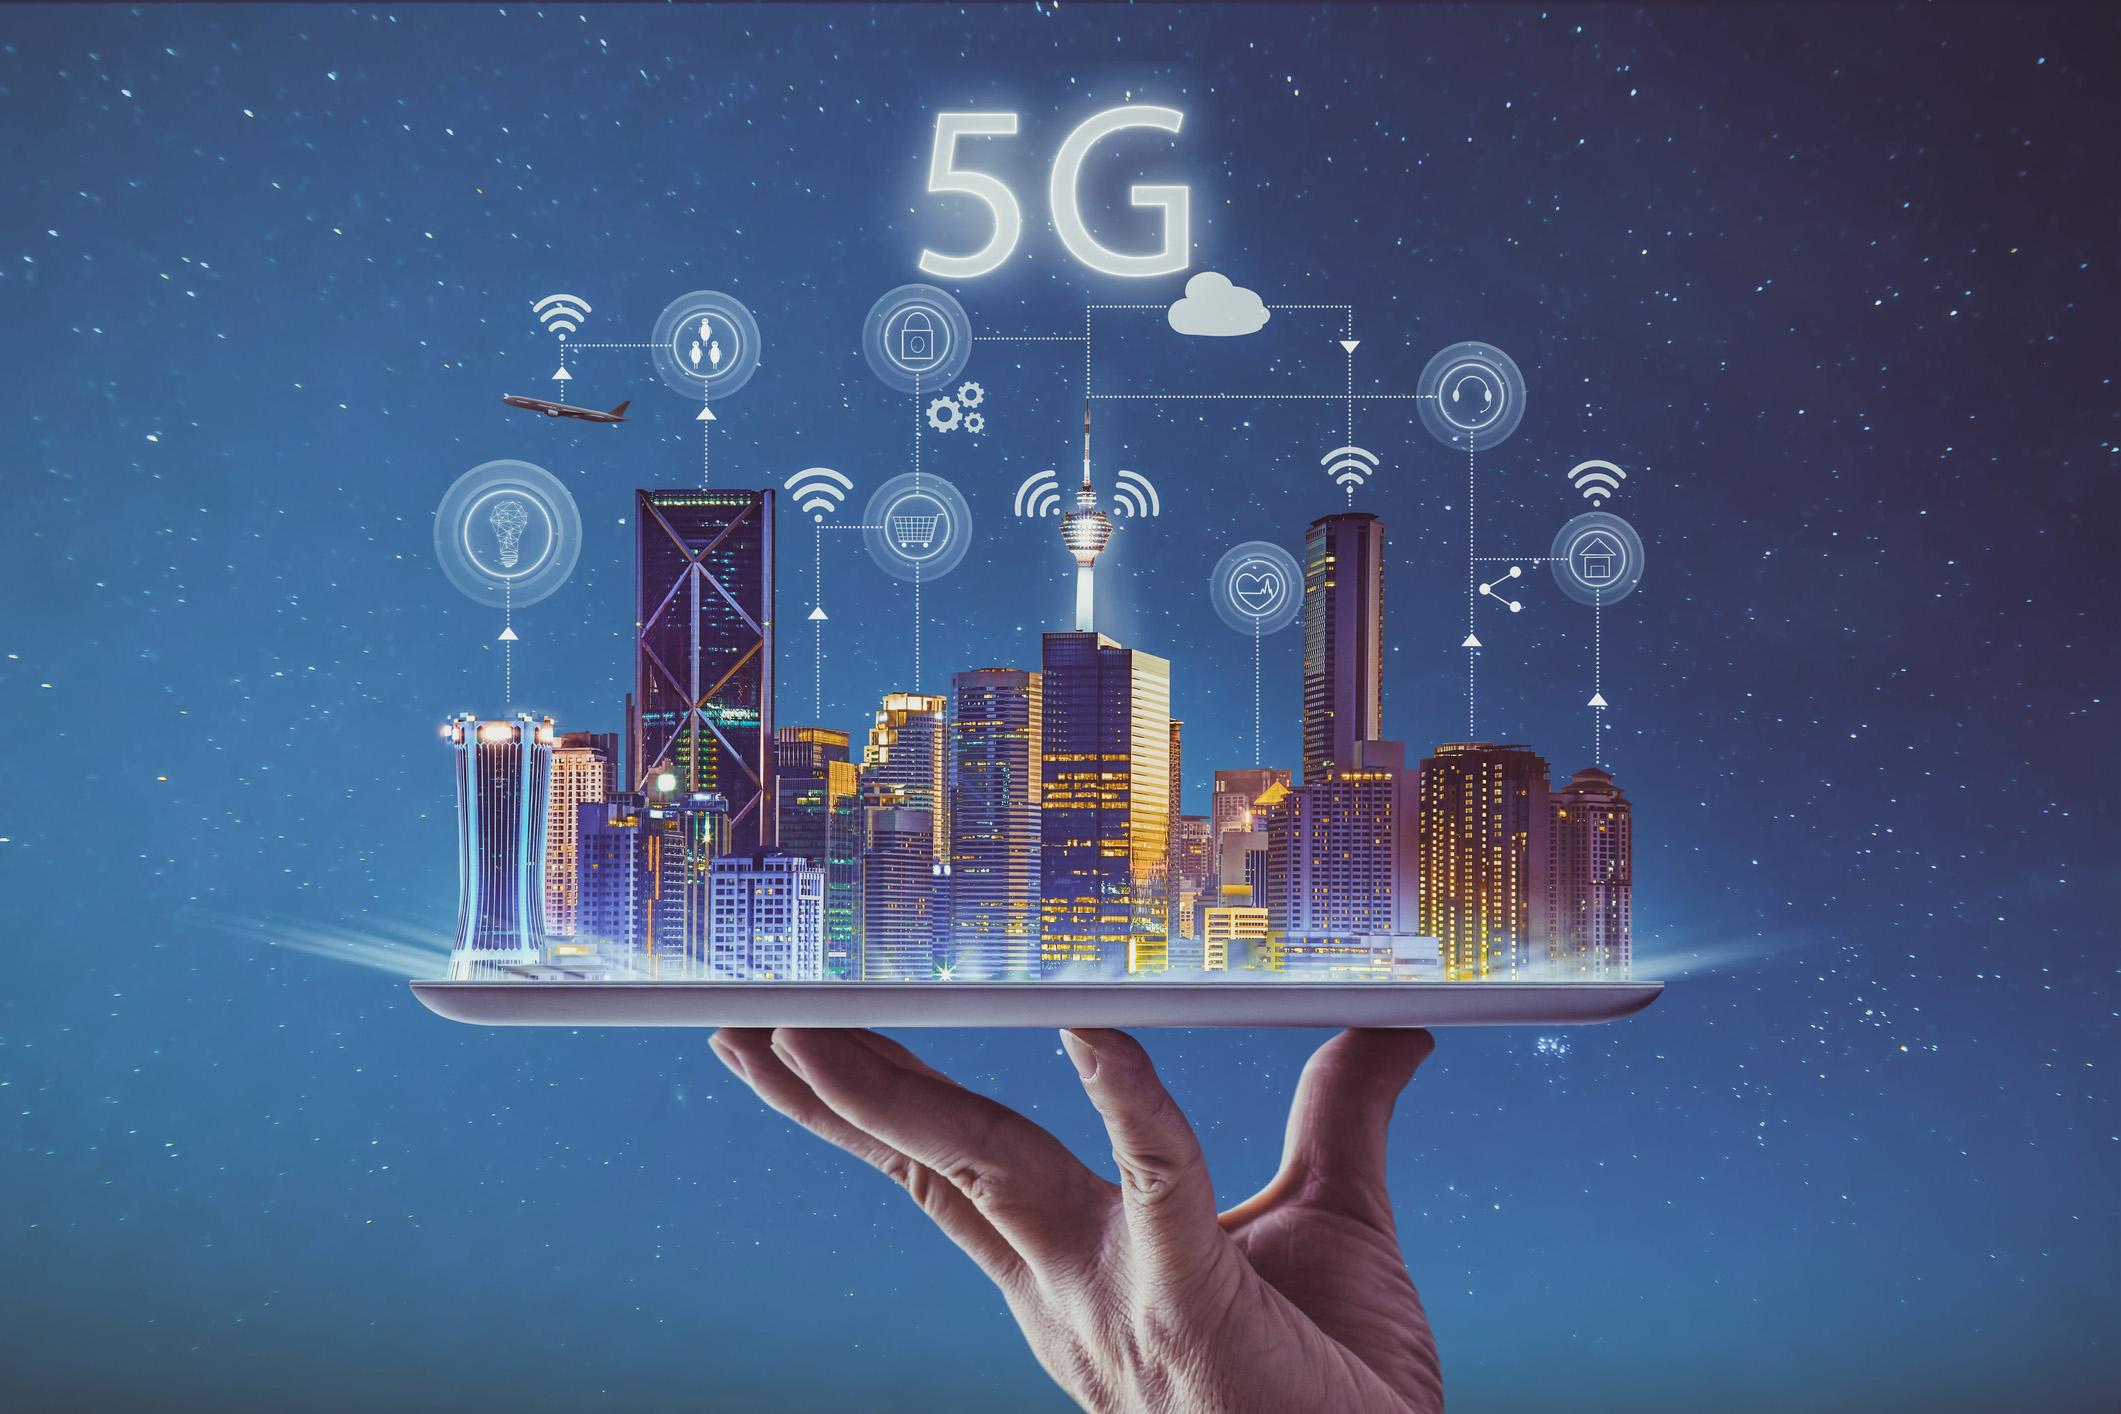 Immagine 5G wireless